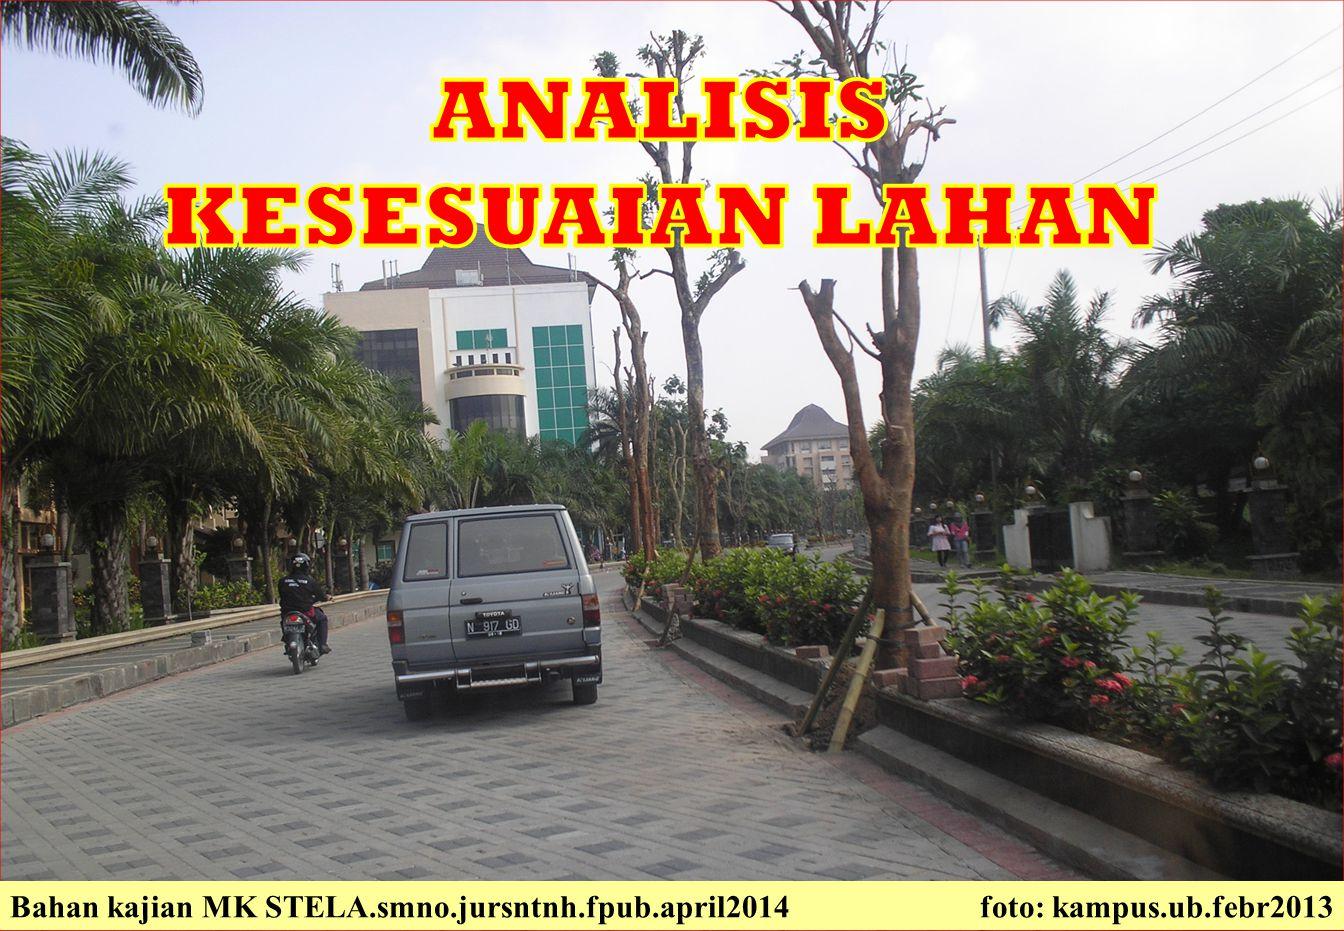 Bahan kajian MK STELA.smno.jursntnh.fpub.april2014 foto: kampus.ub.febr2013